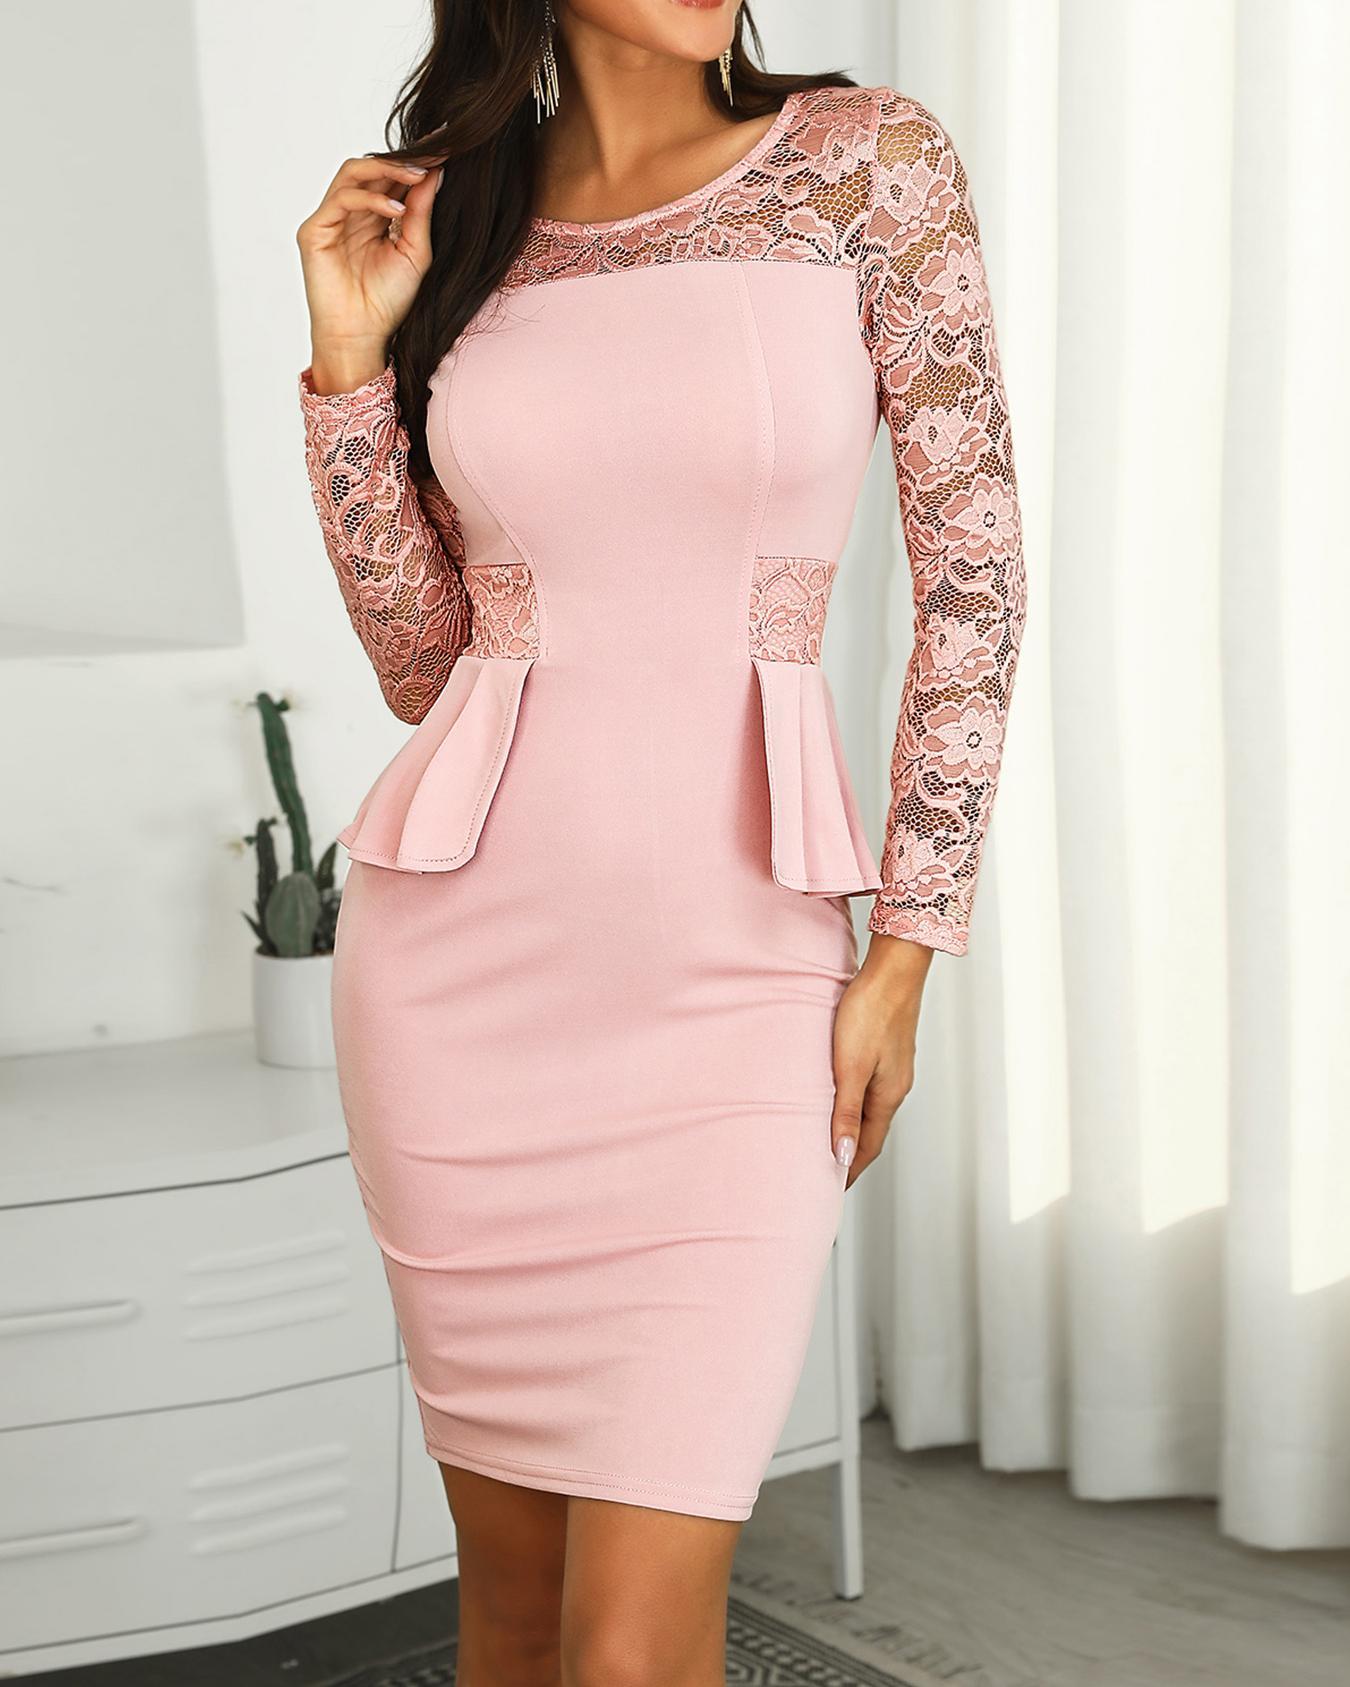 Lace Splicing Peplum Bodycon Dress, Pink